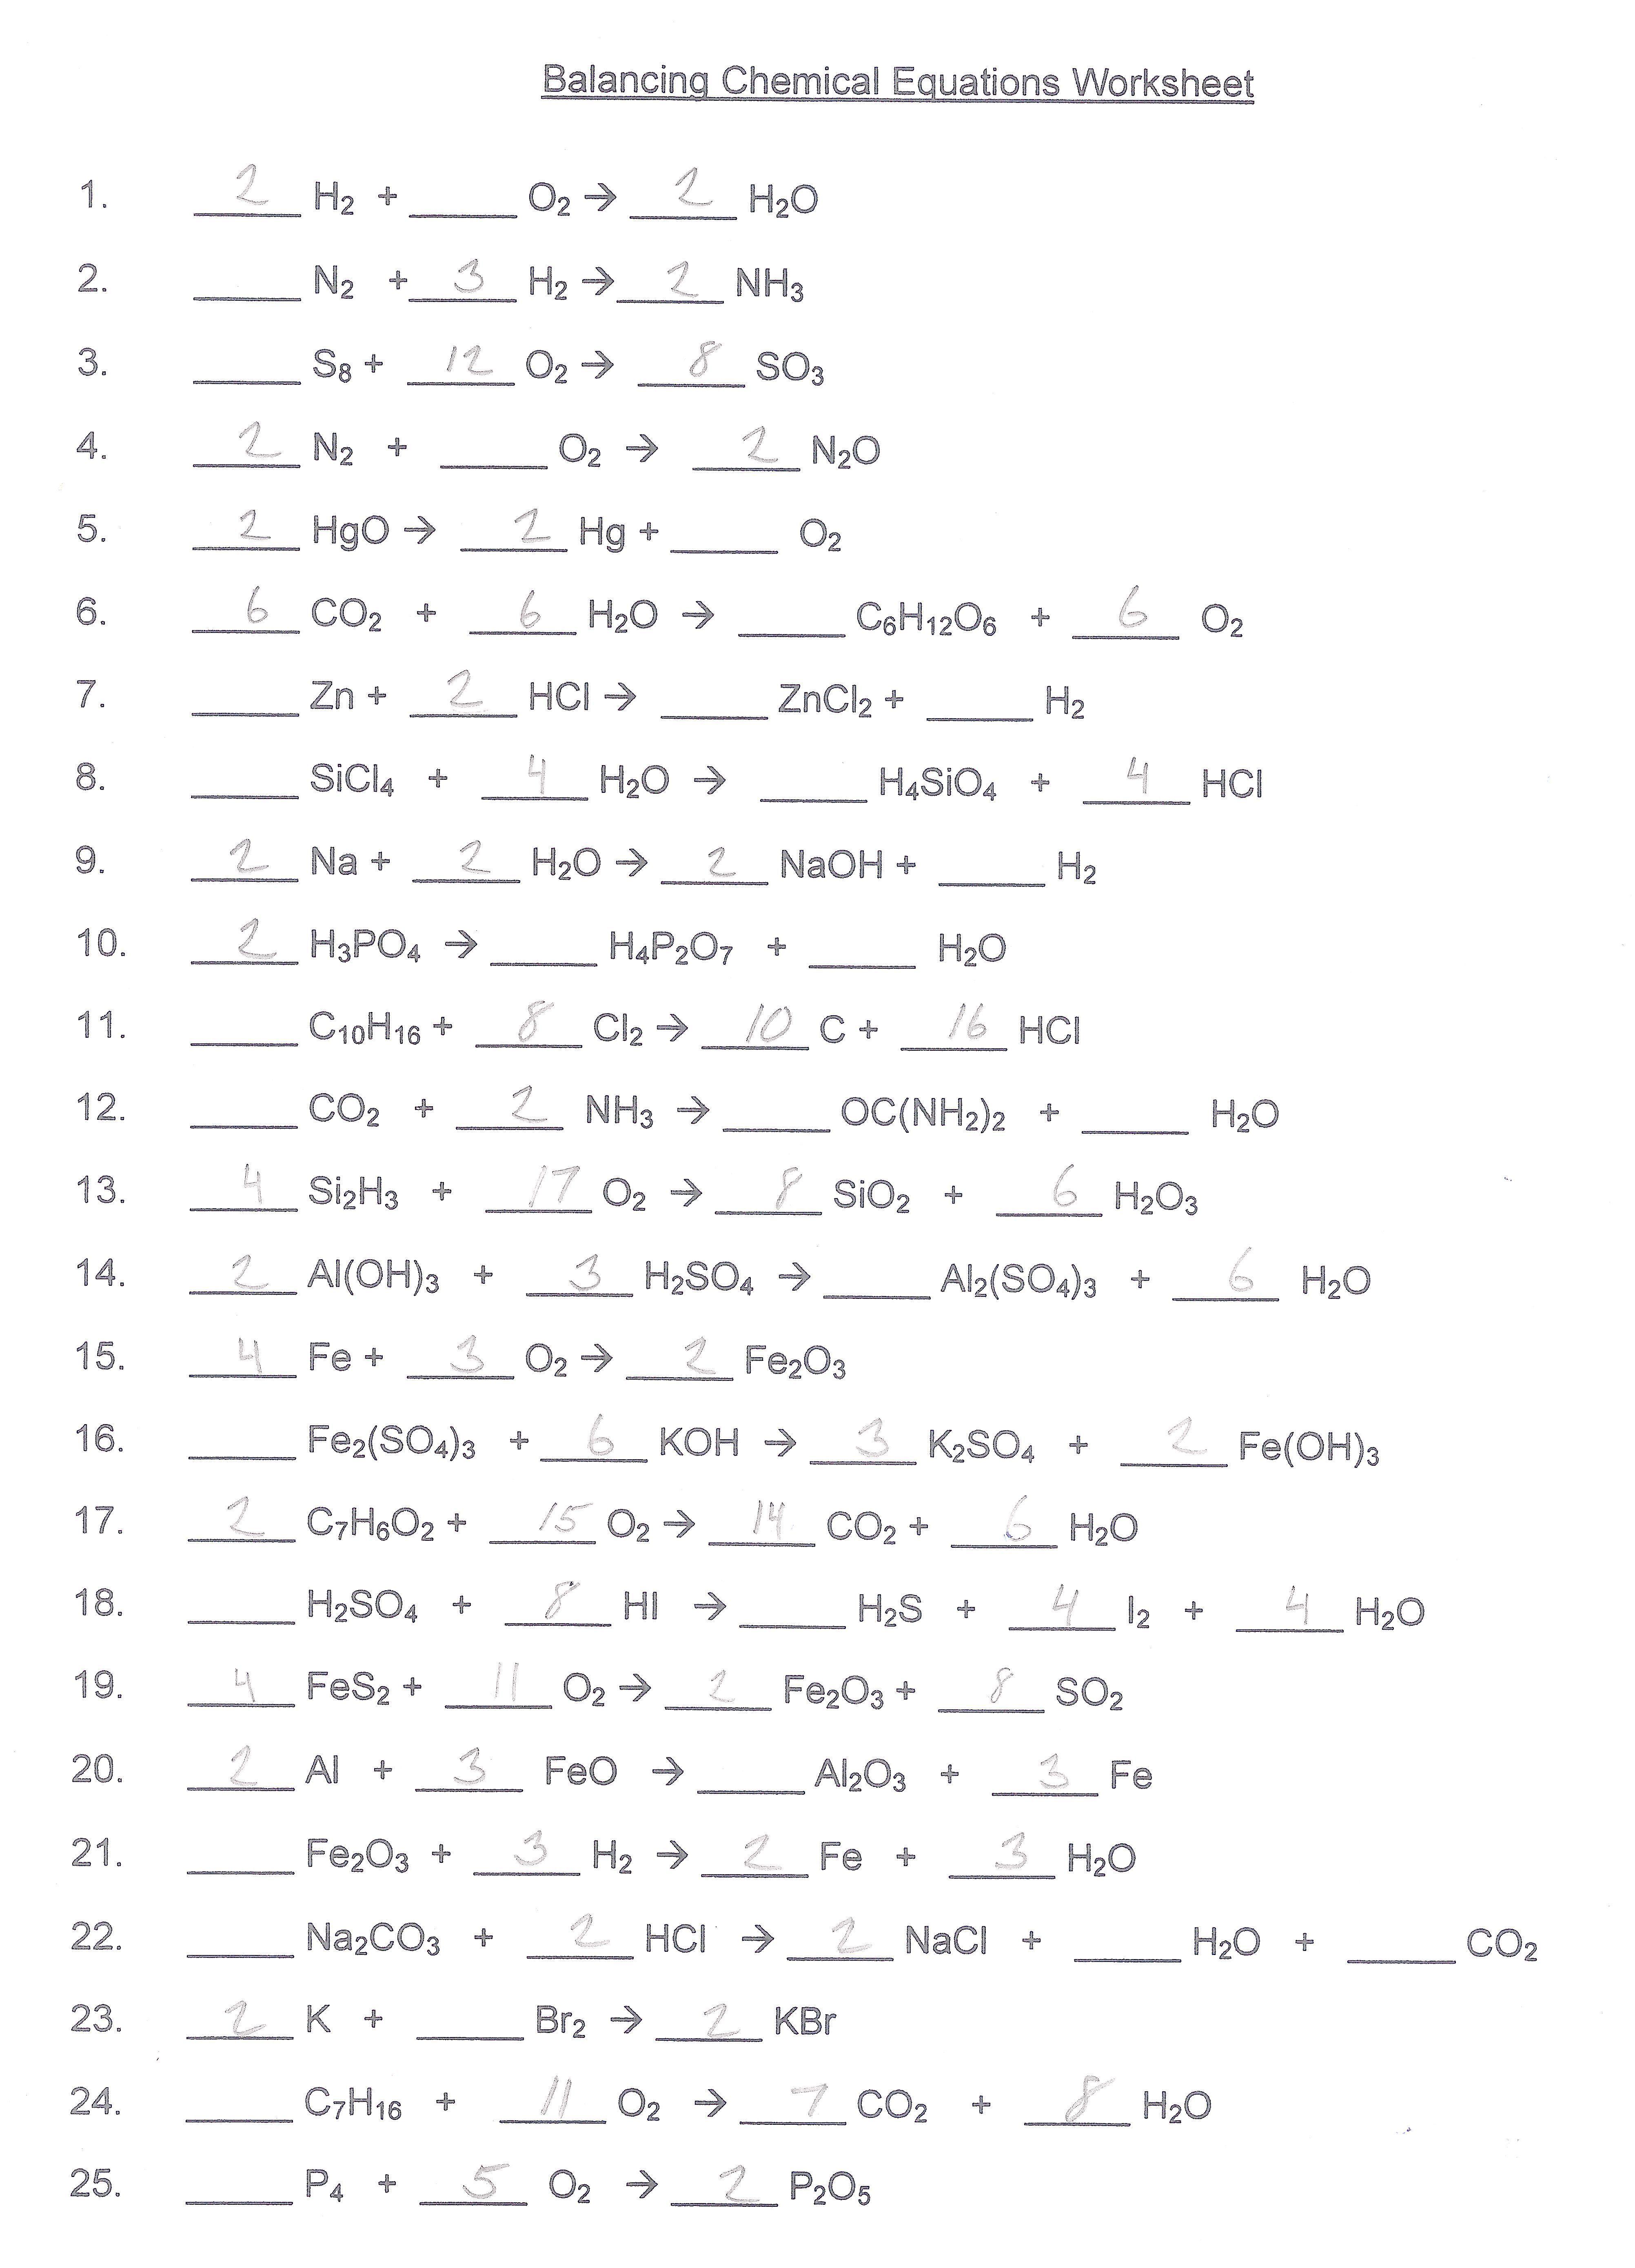 Balance Chemical Equations Worksheet 1431487